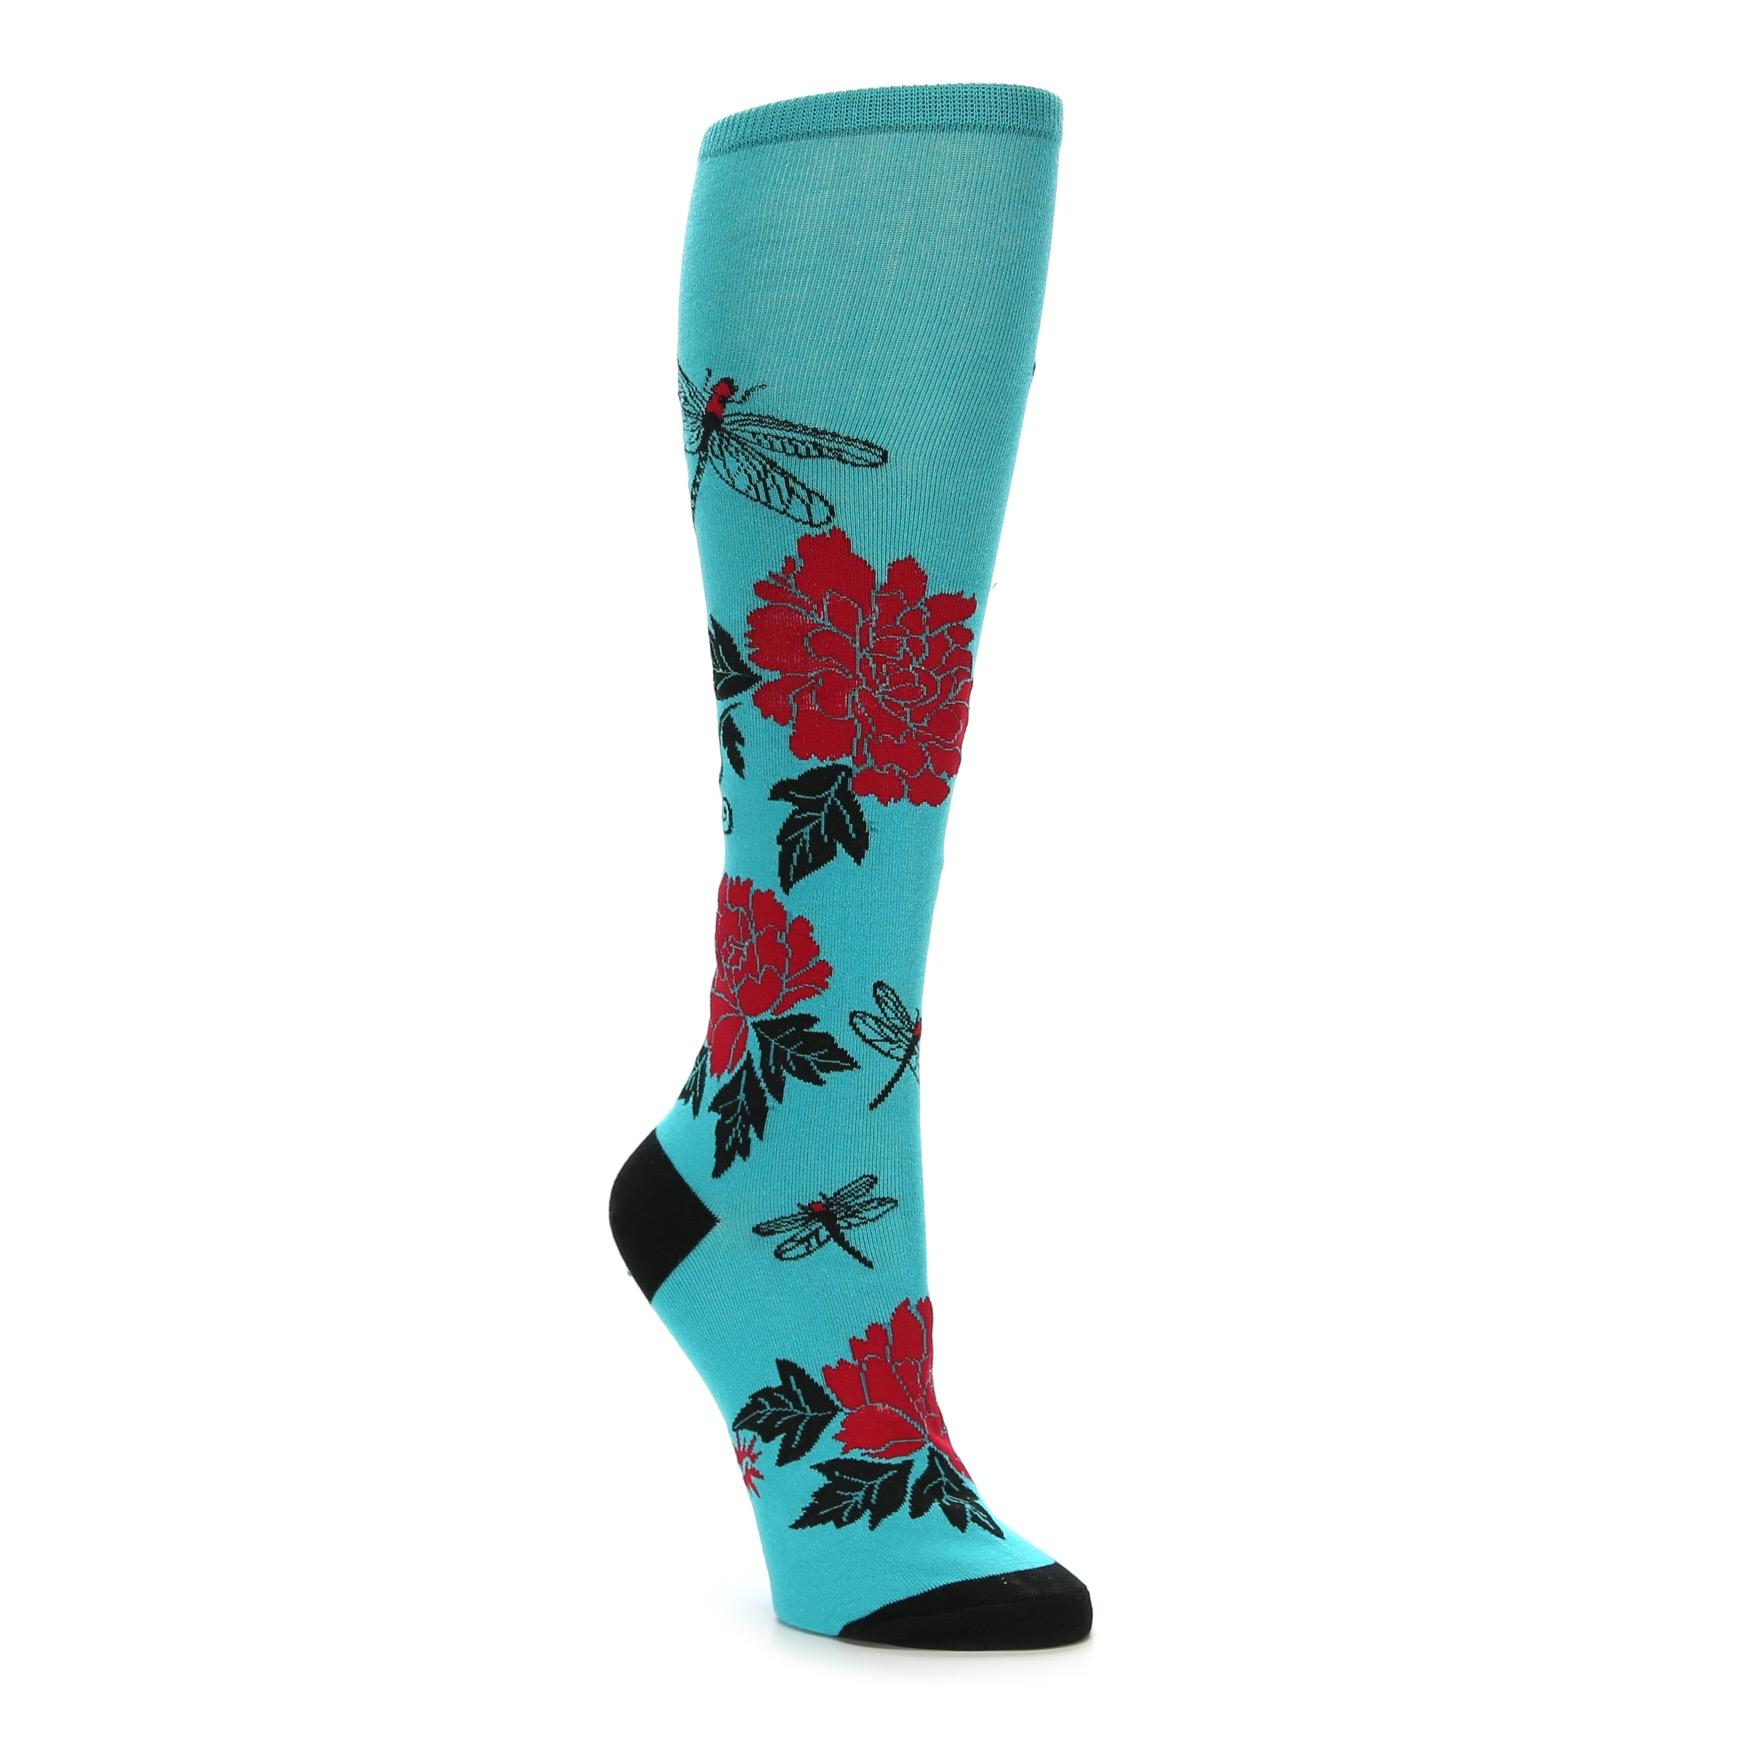 b7a31d5b8 Teal Red Black Peonies Women s Knee High Socks